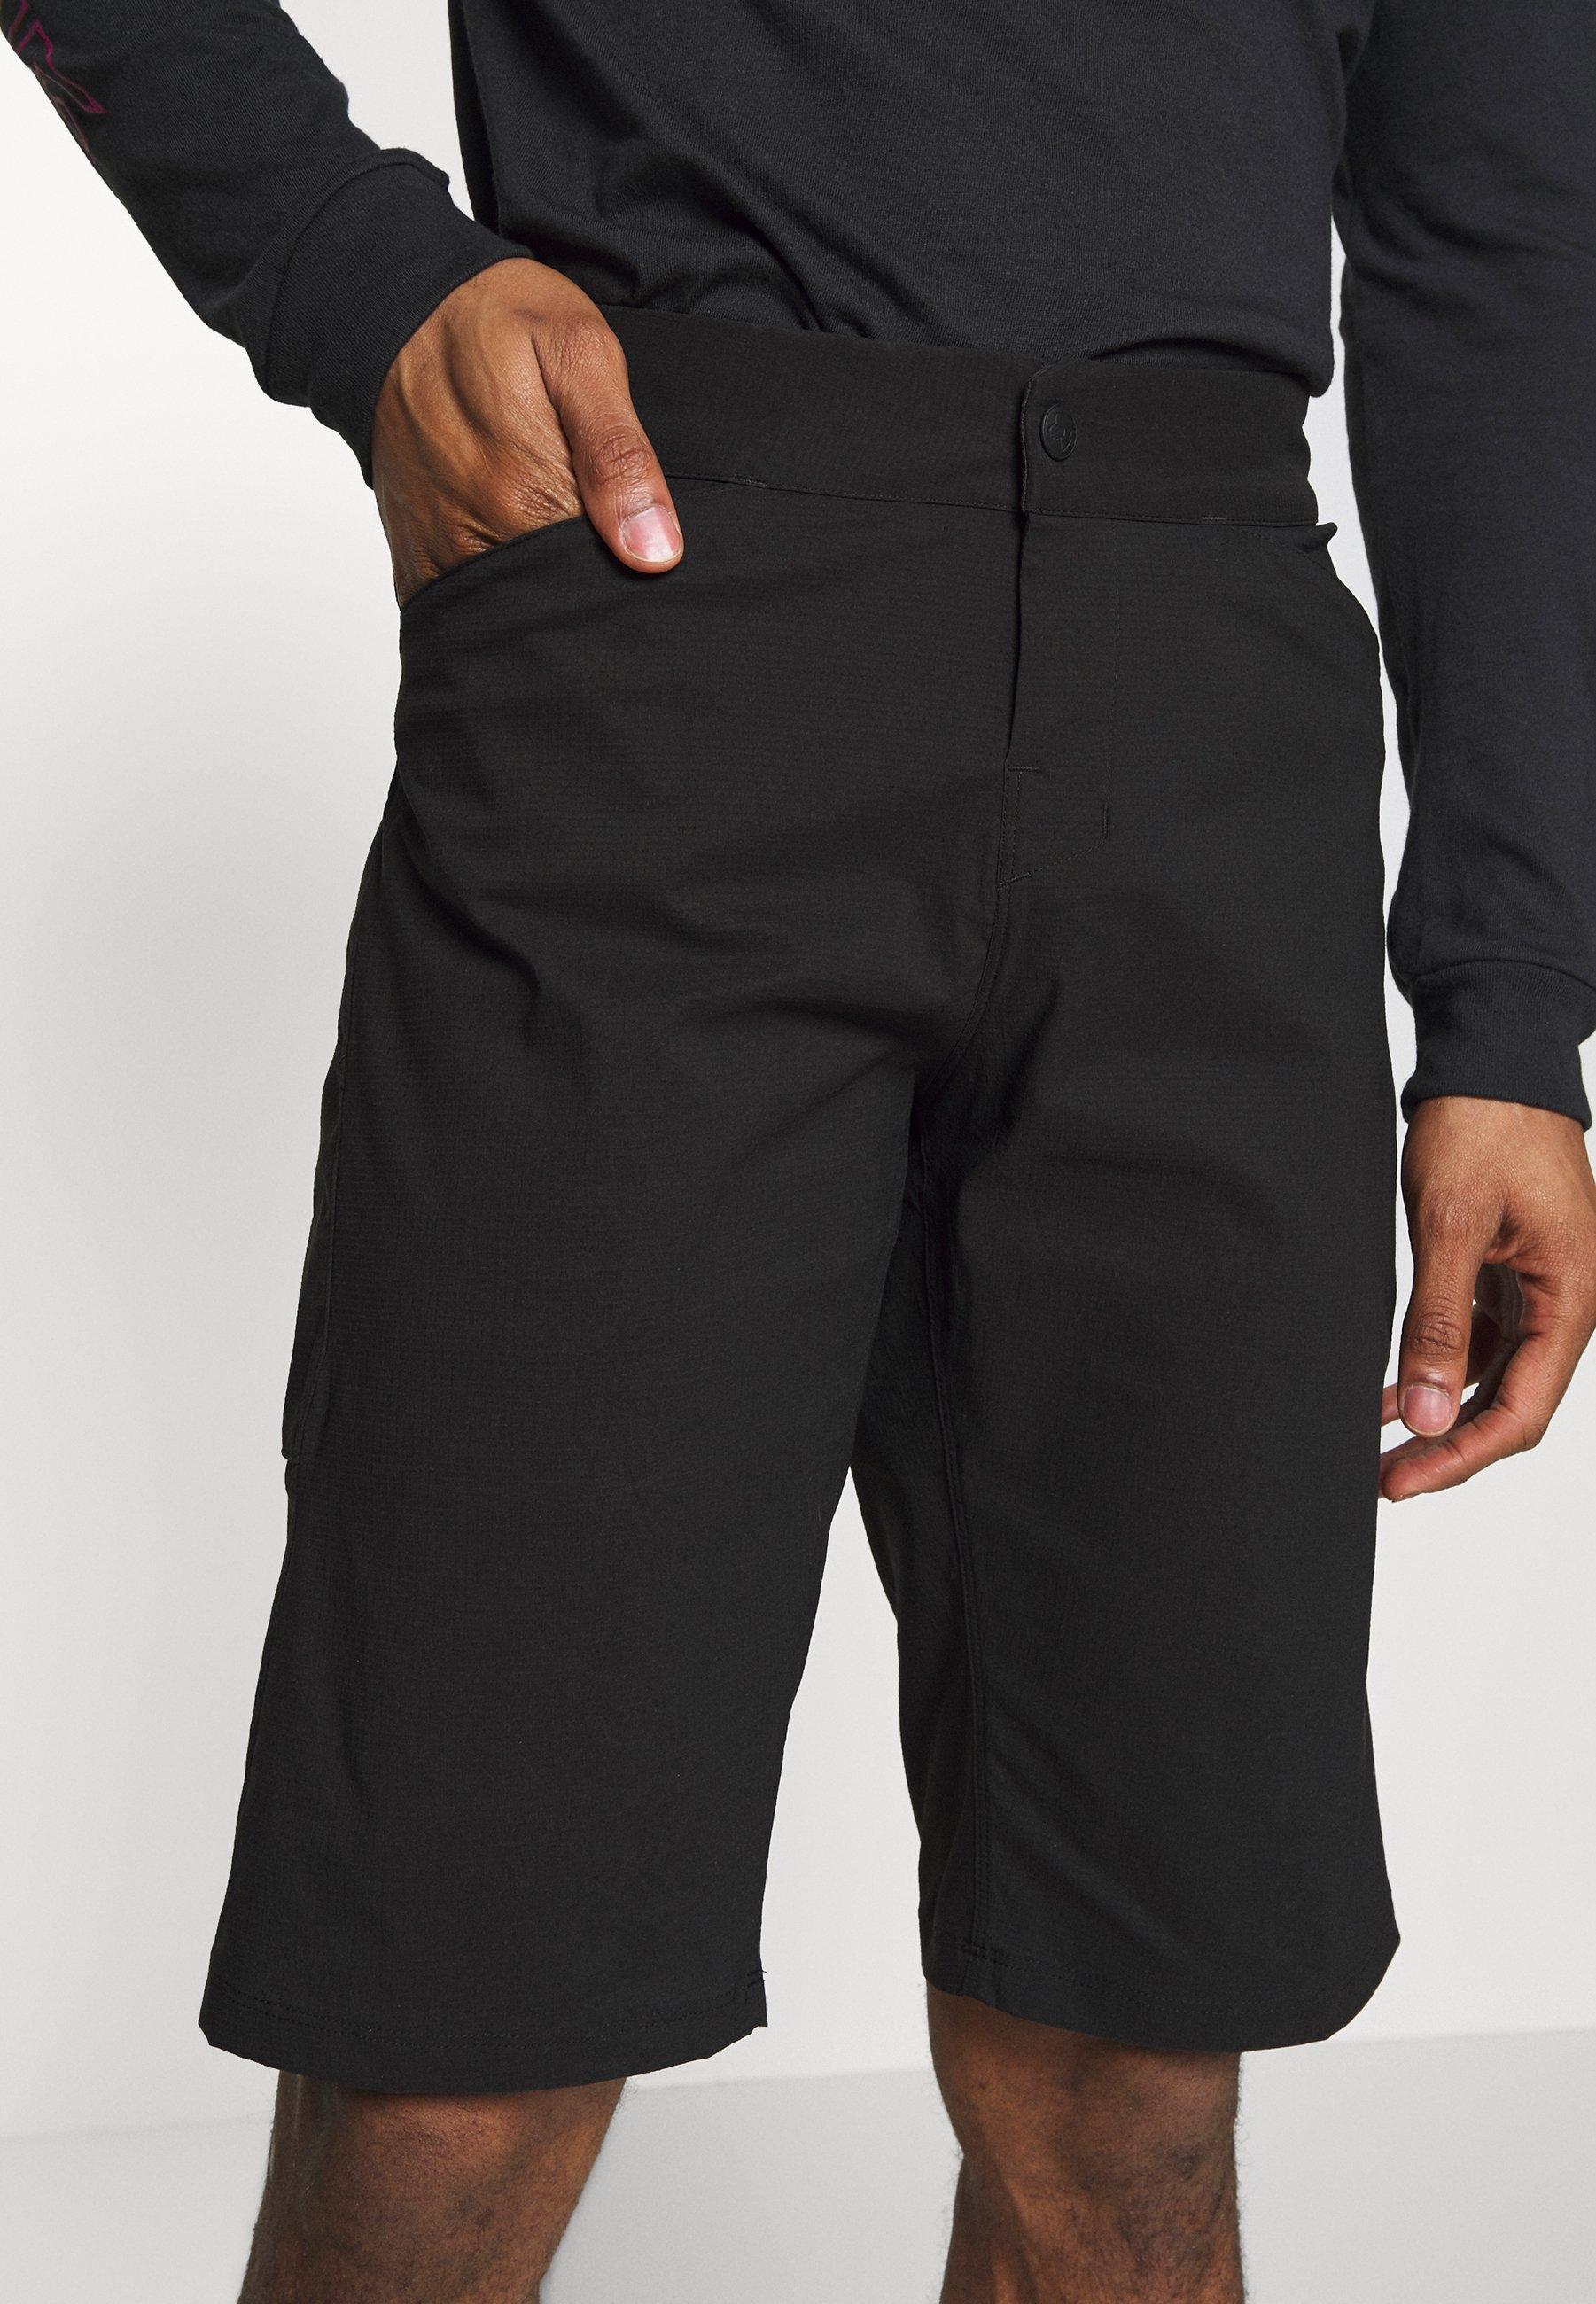 RANGER UTILITY SHORT 2 IN 1 kurze Sporthose black